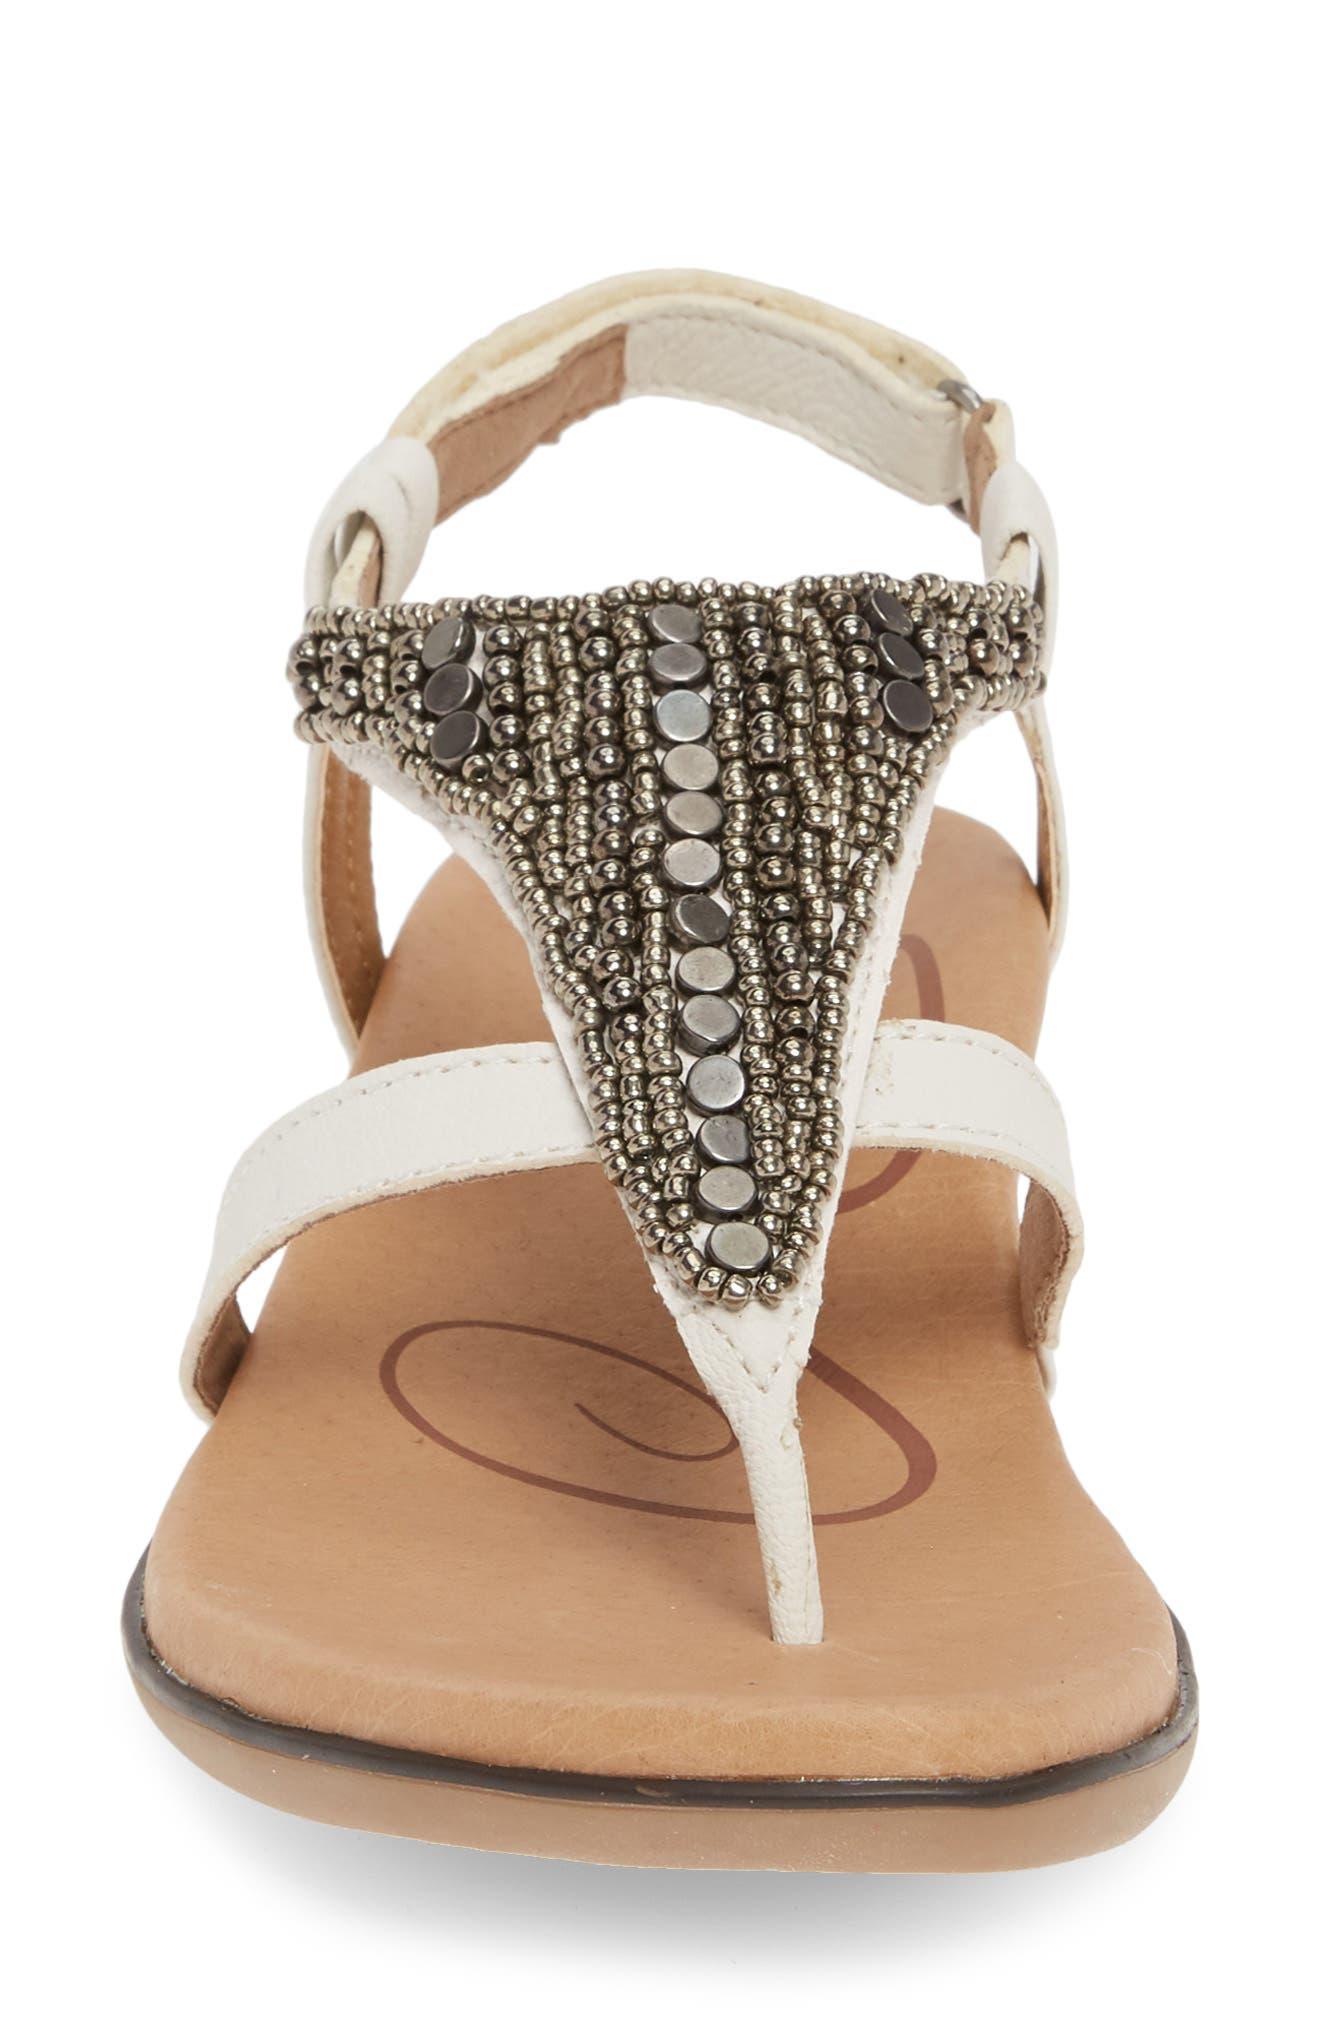 AETREX, Sheila Embellished Sandal, Alternate thumbnail 4, color, WHITE LEATHER